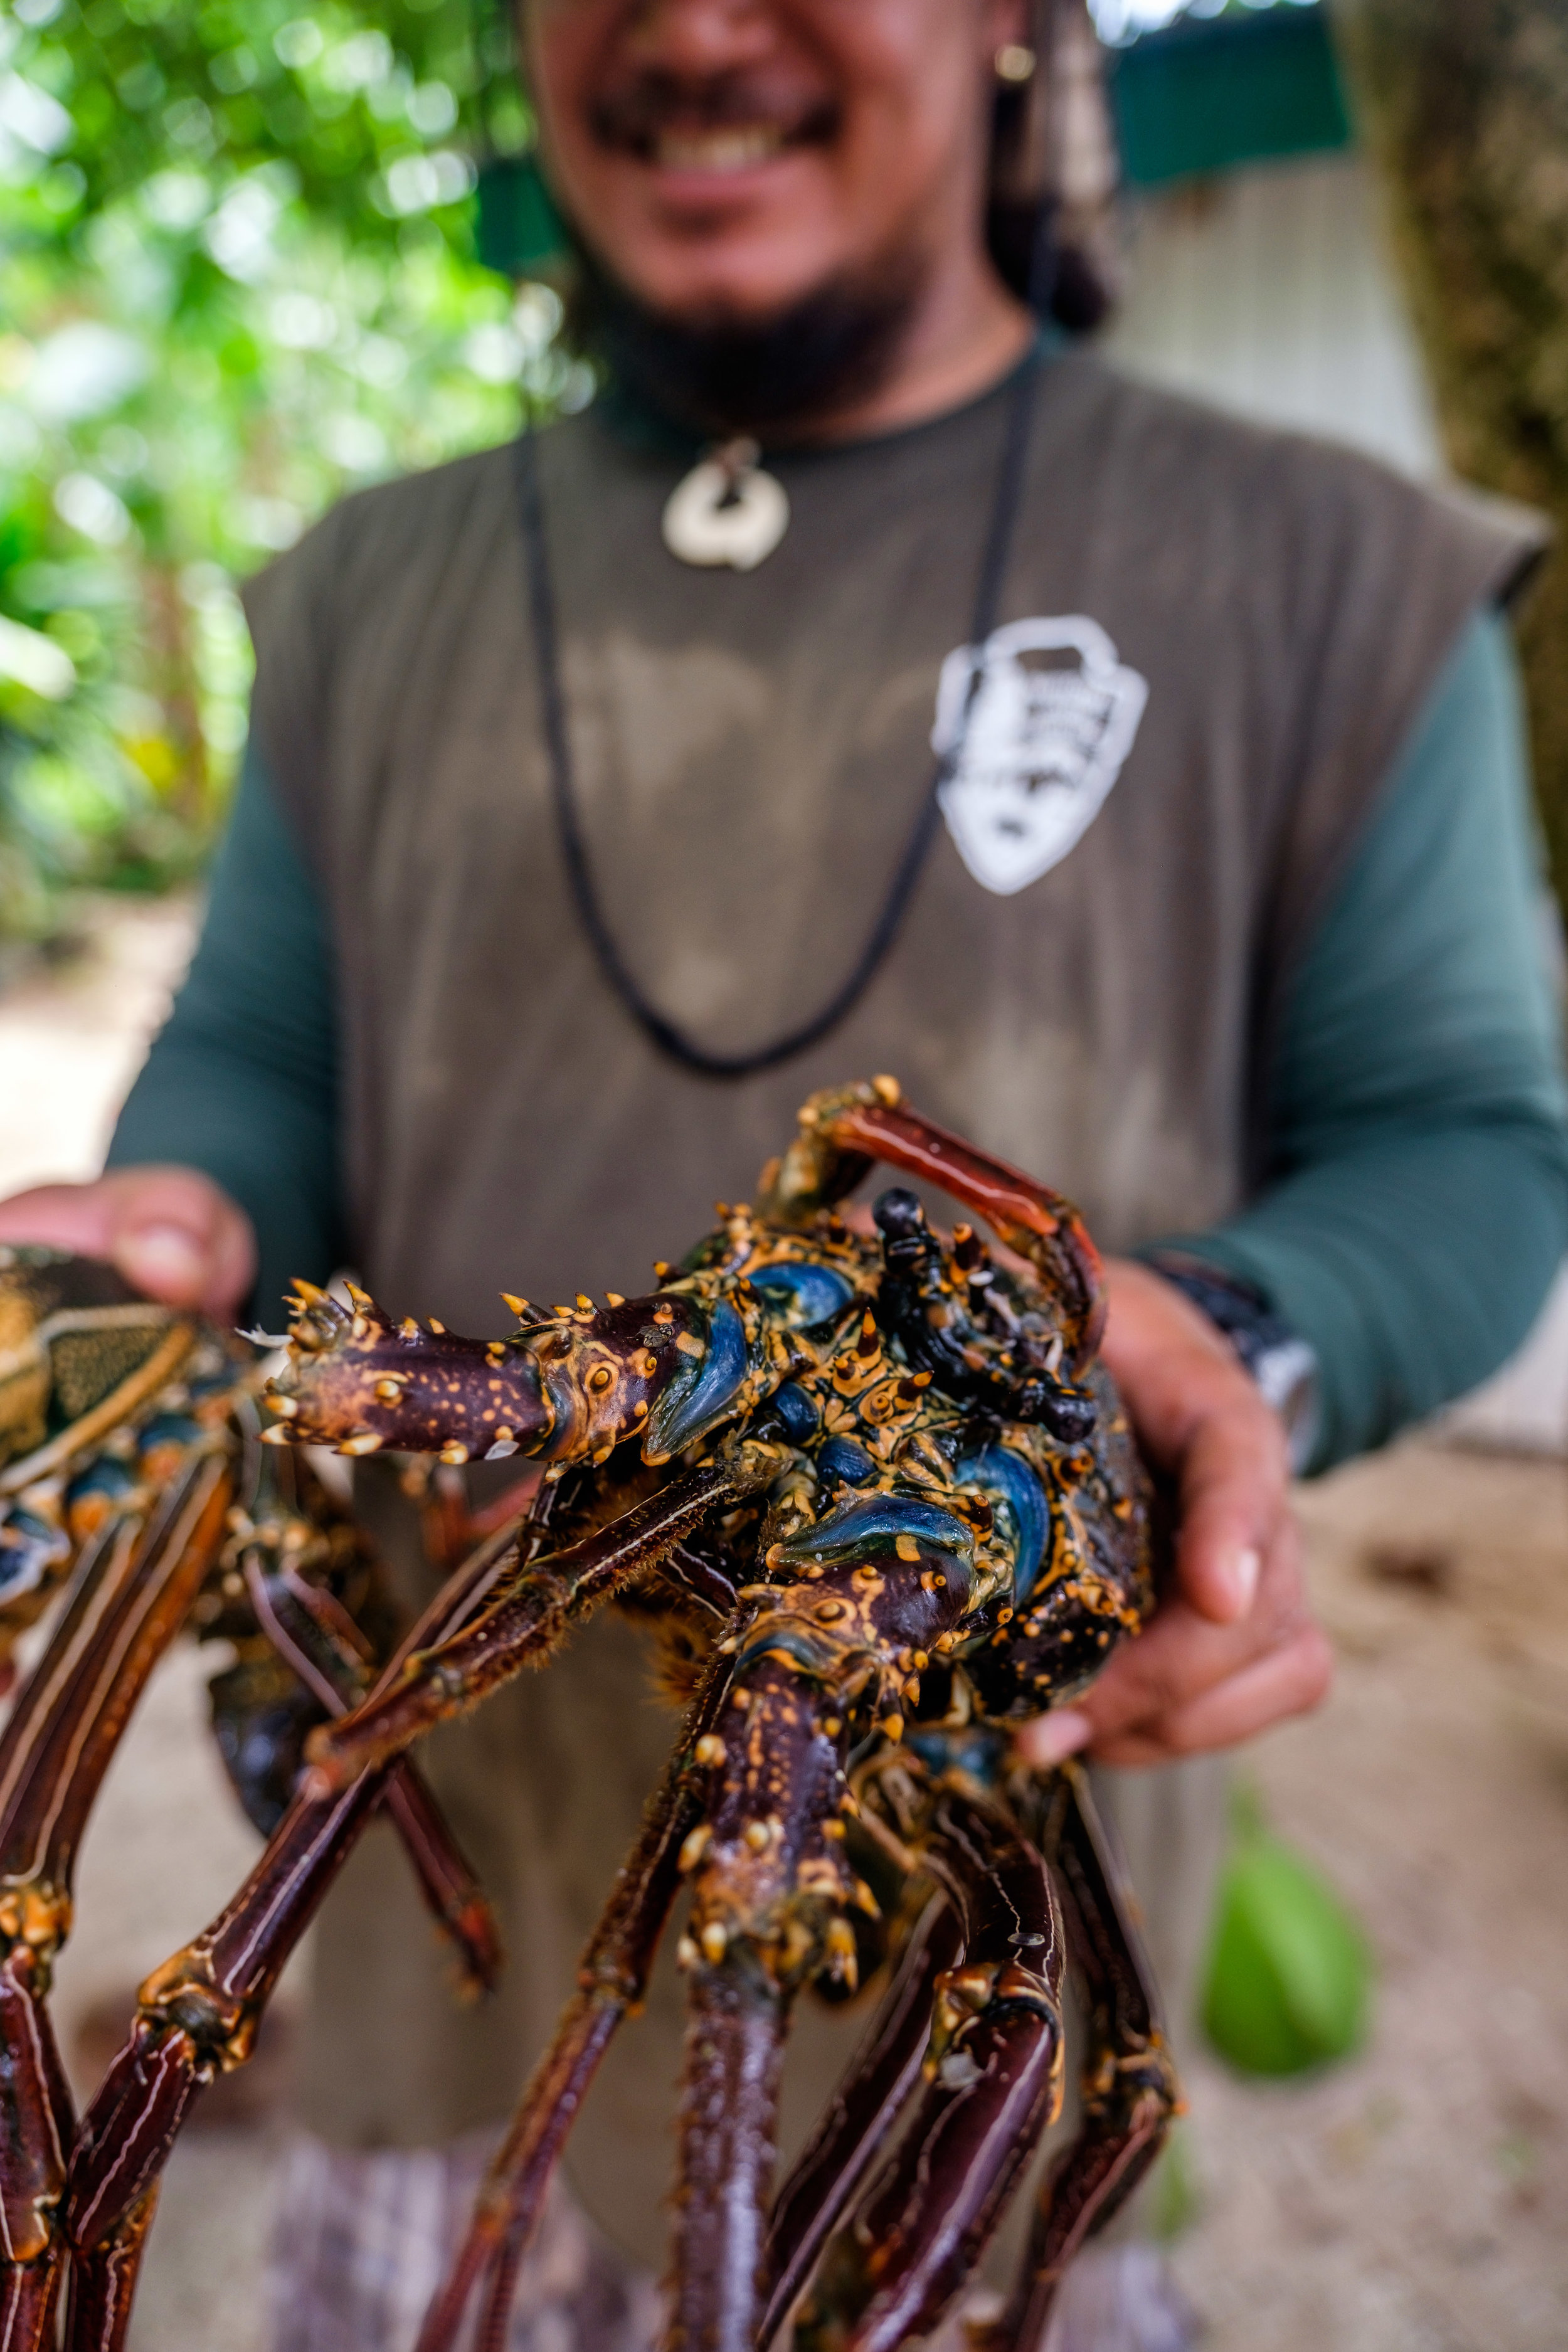 20161214-JI-American Samoa National Park-_DSF1503.jpg